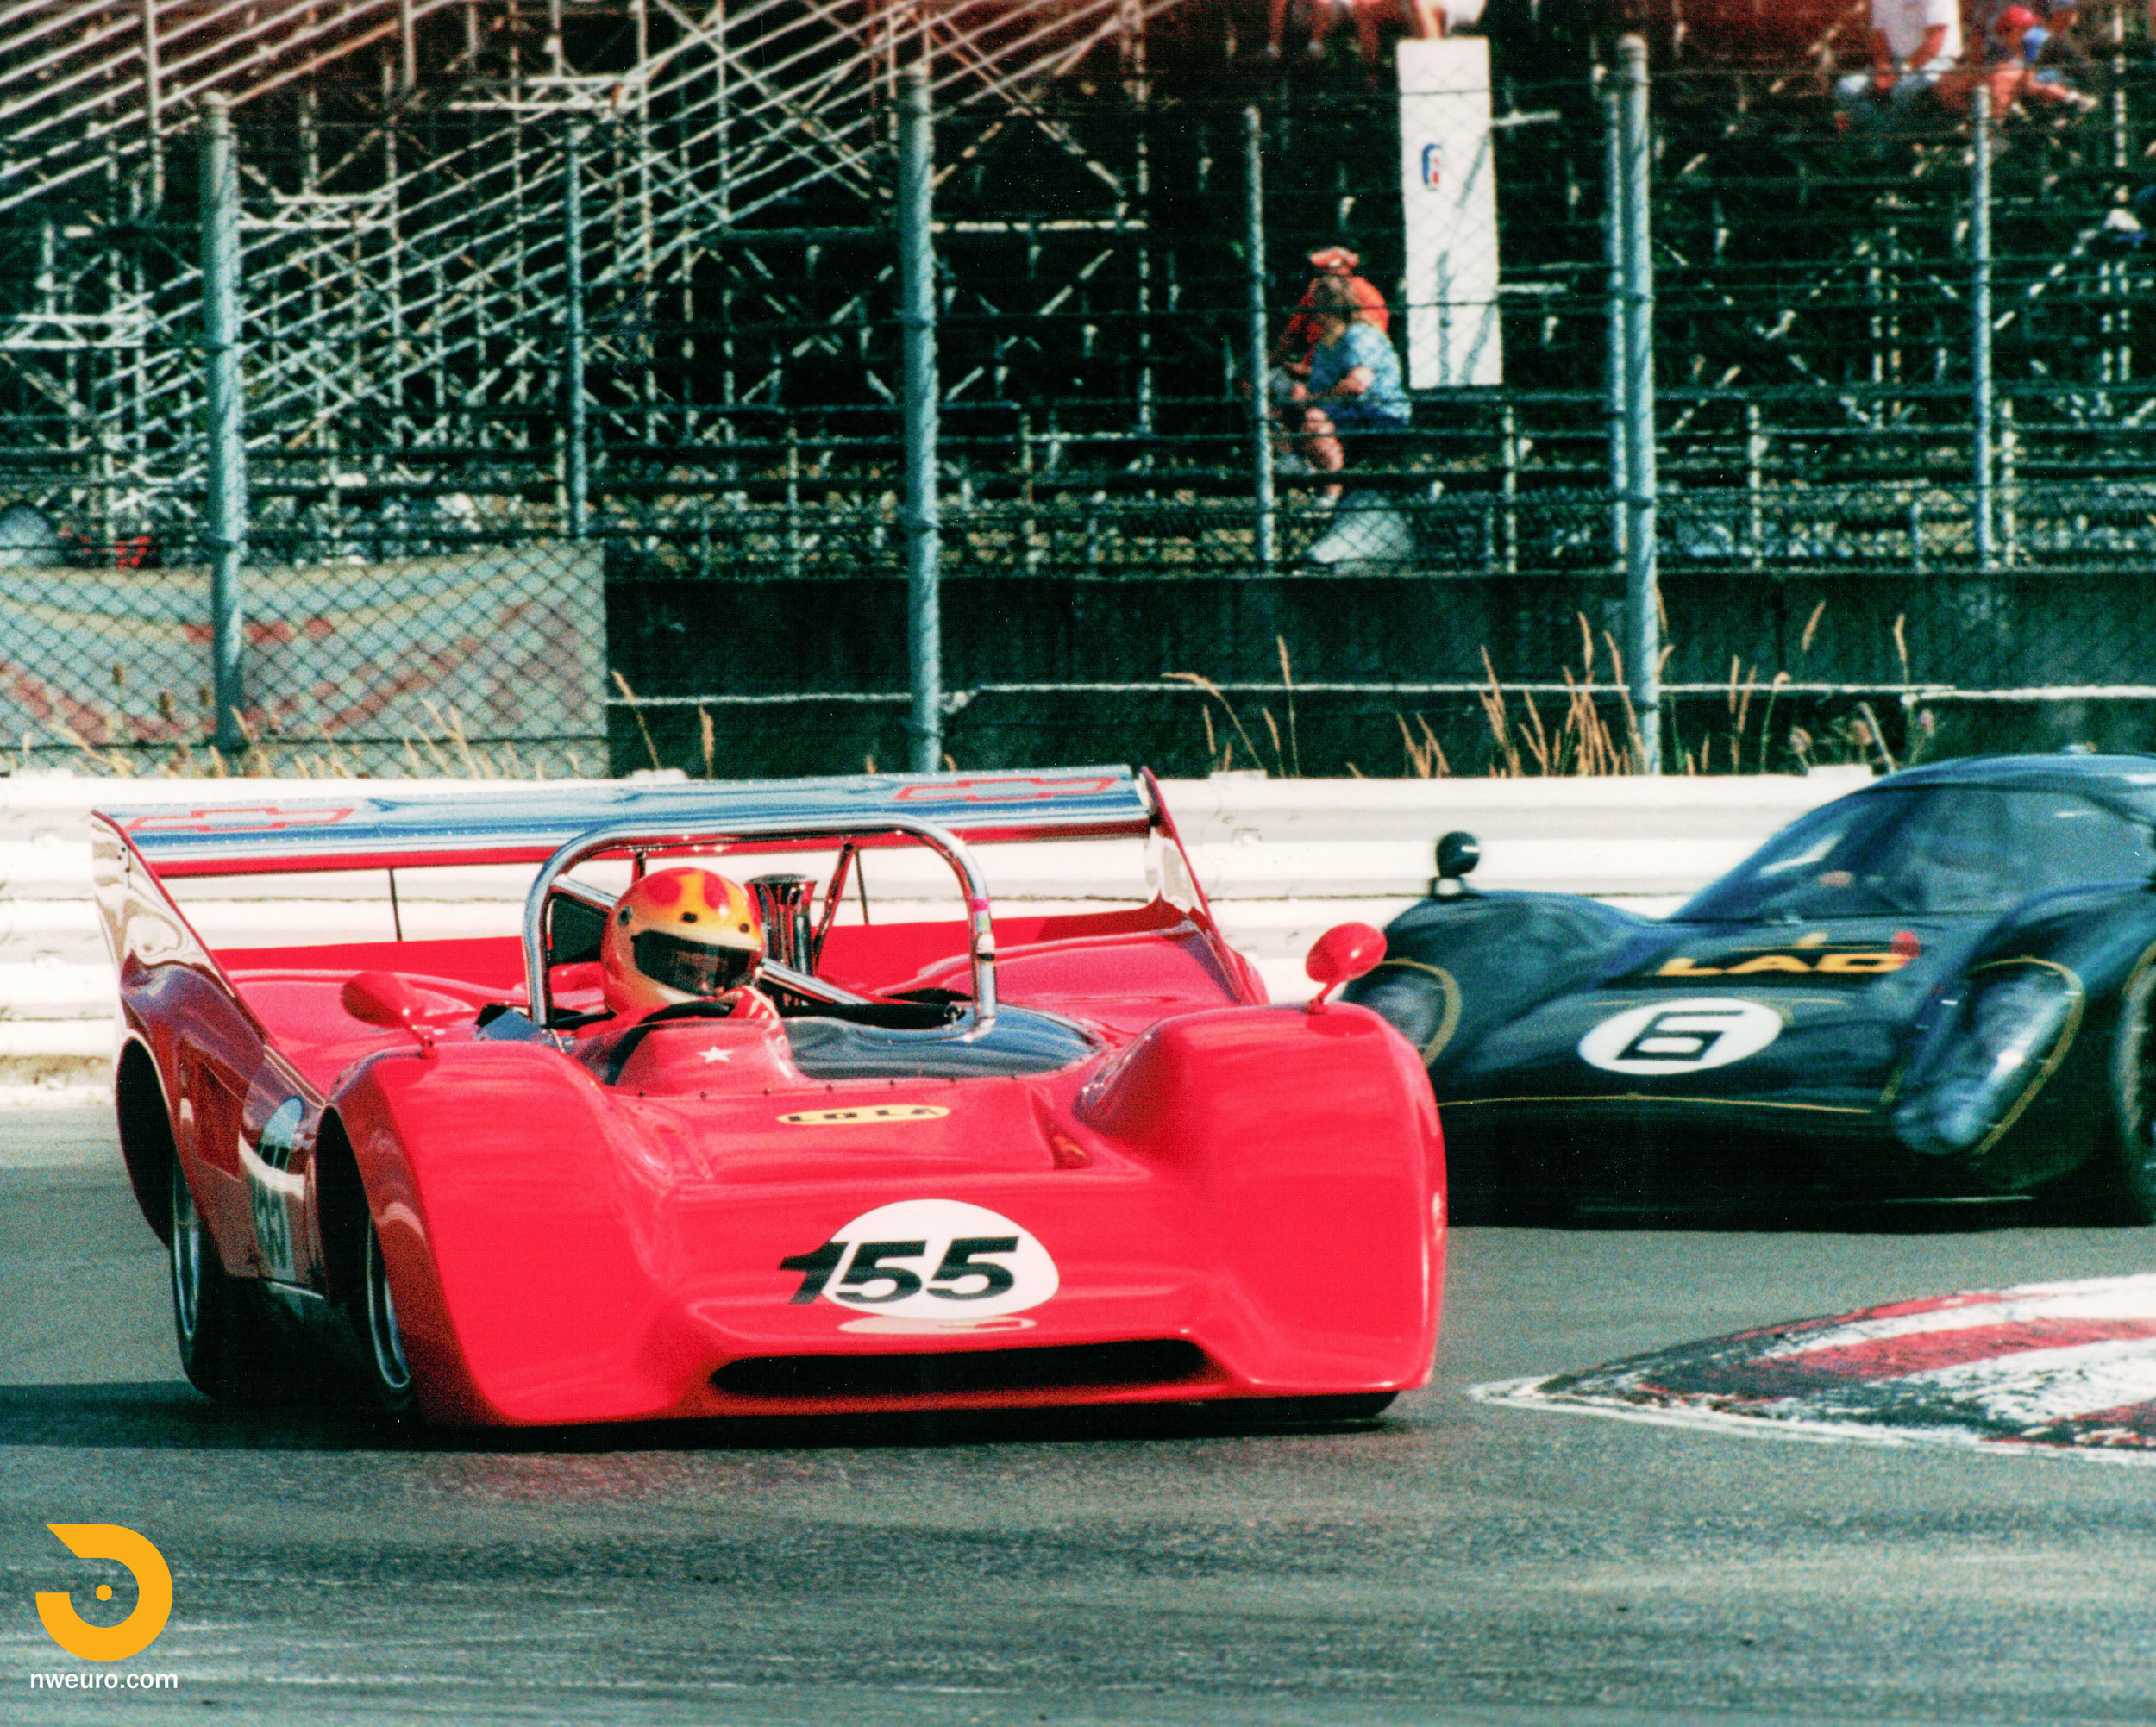 1969 Lola T162 Can-Am Race Car Action Shots-6.jpg